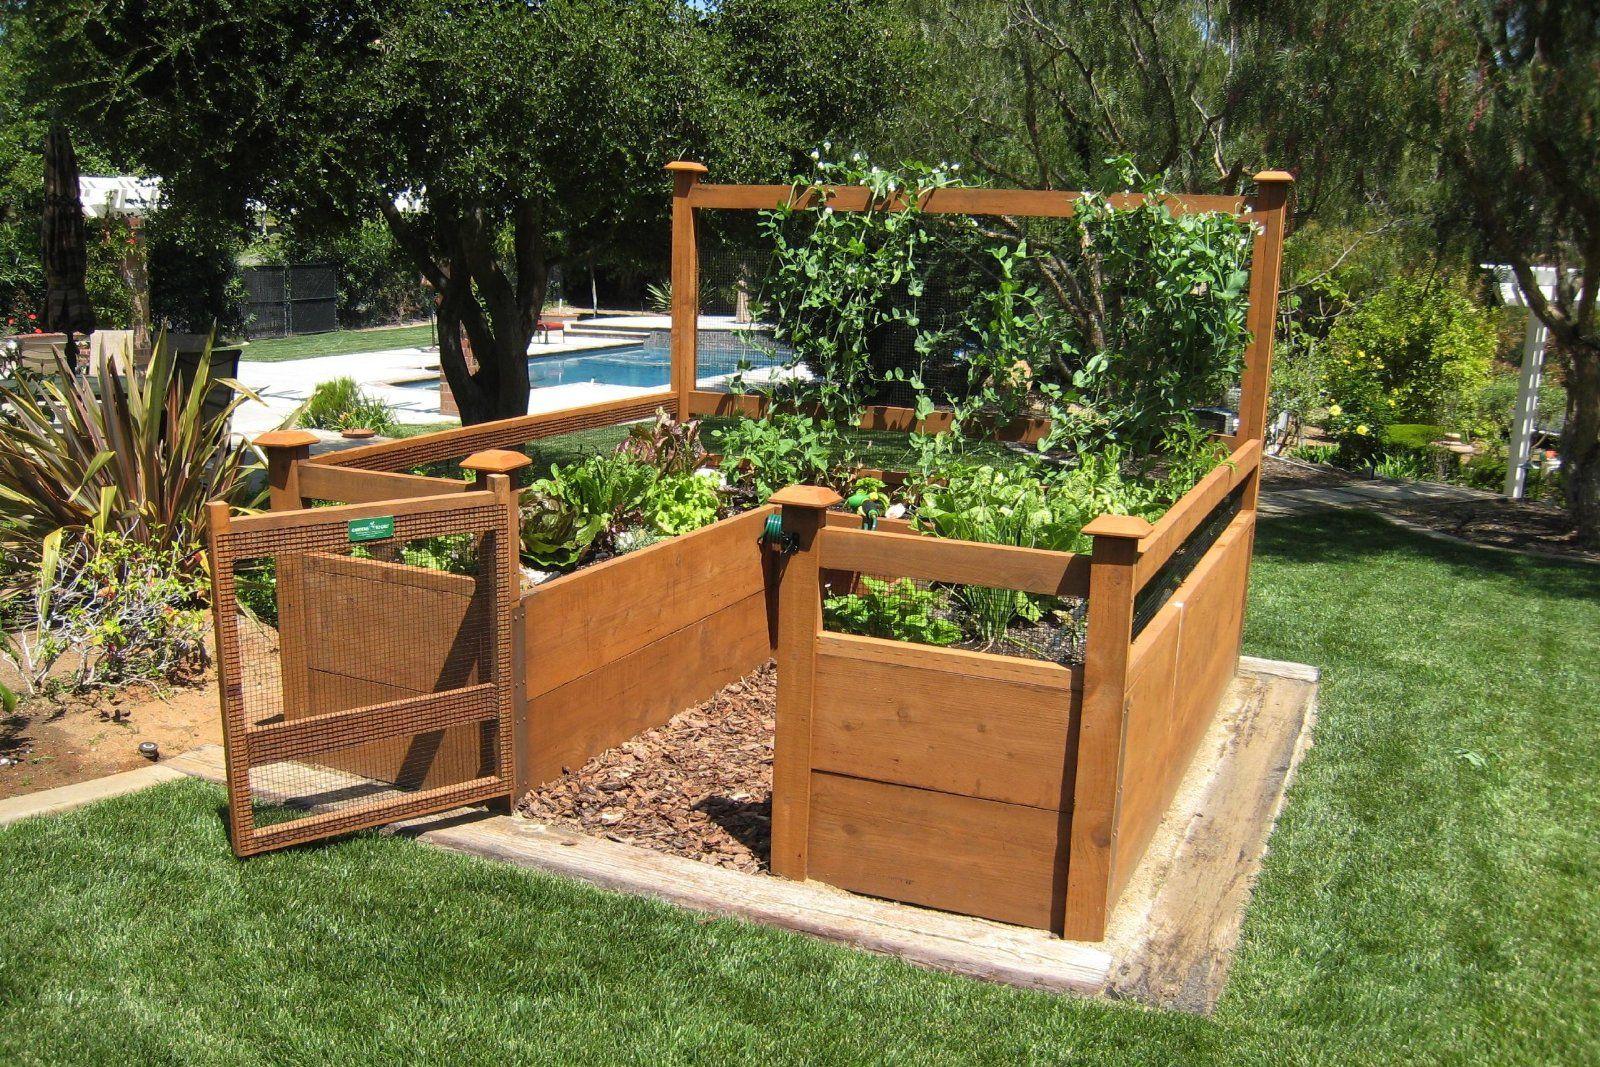 Just Add Lumber Vegetable Garden Kit 8'x8' DeluxeAmazon